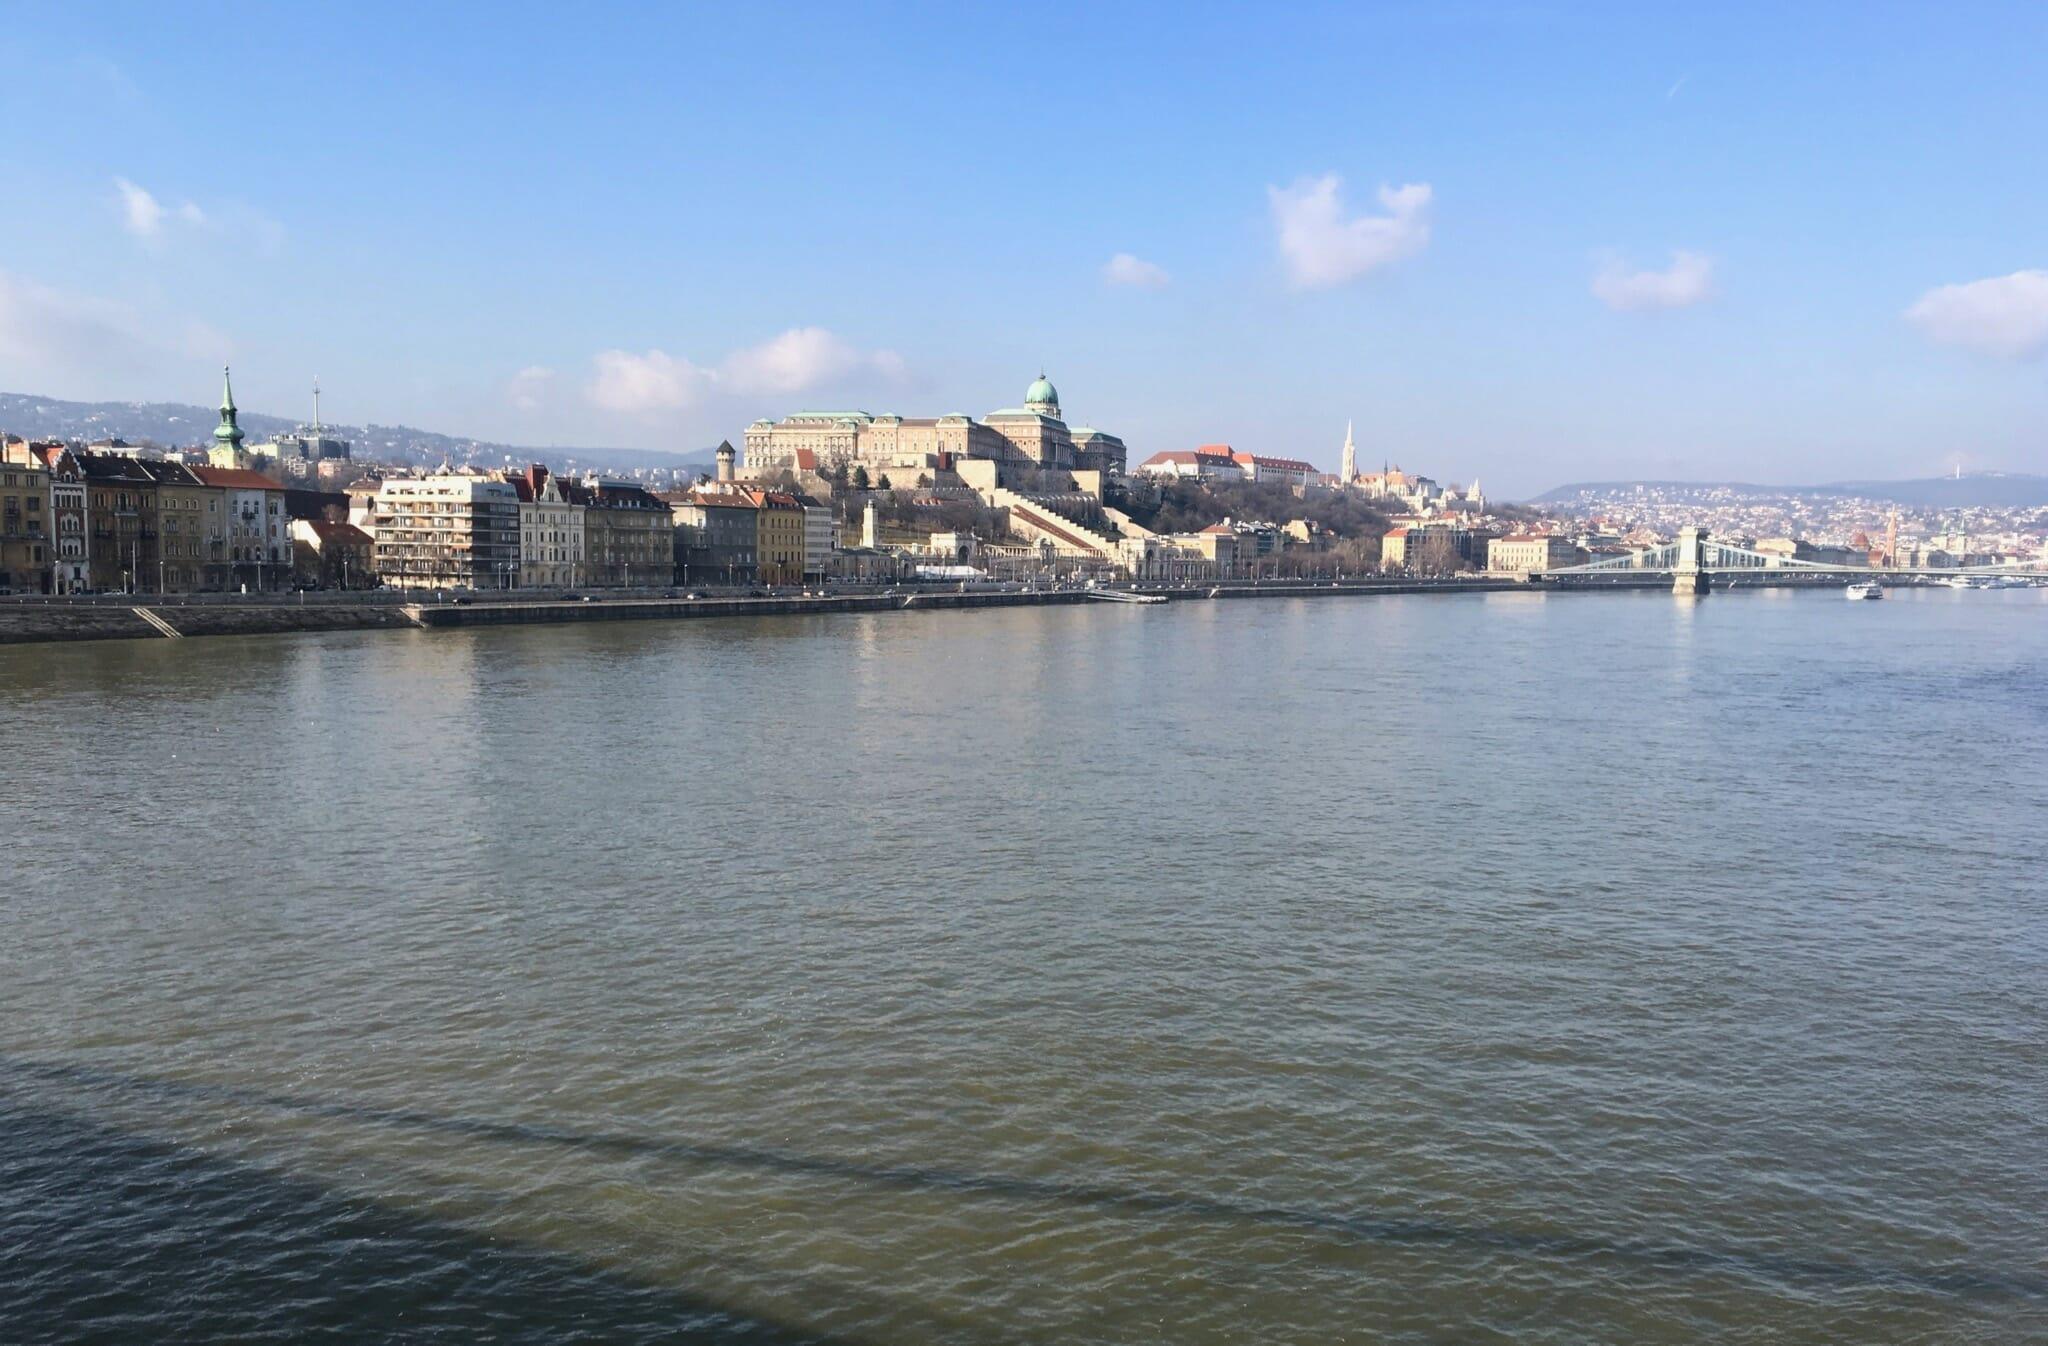 Buda Castle from the Elisabeth Bridge